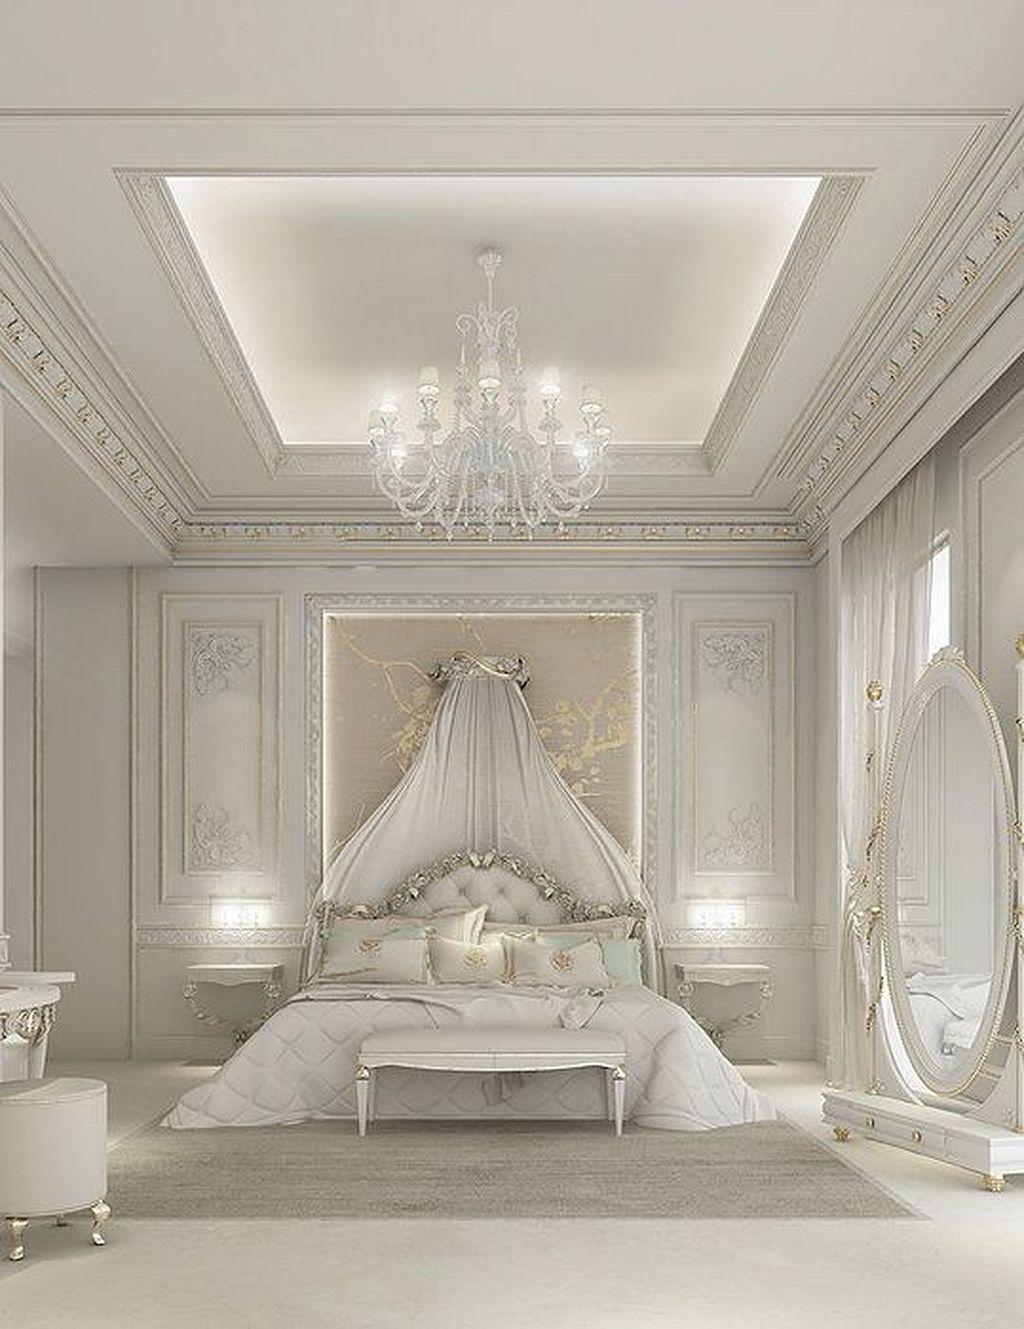 Luxury Master Bedrooms New Pin By Otisha White On Bedroom Interior In 2020 Luxury Bedroom Master Luxurious Bedrooms Luxury Bedroom Design